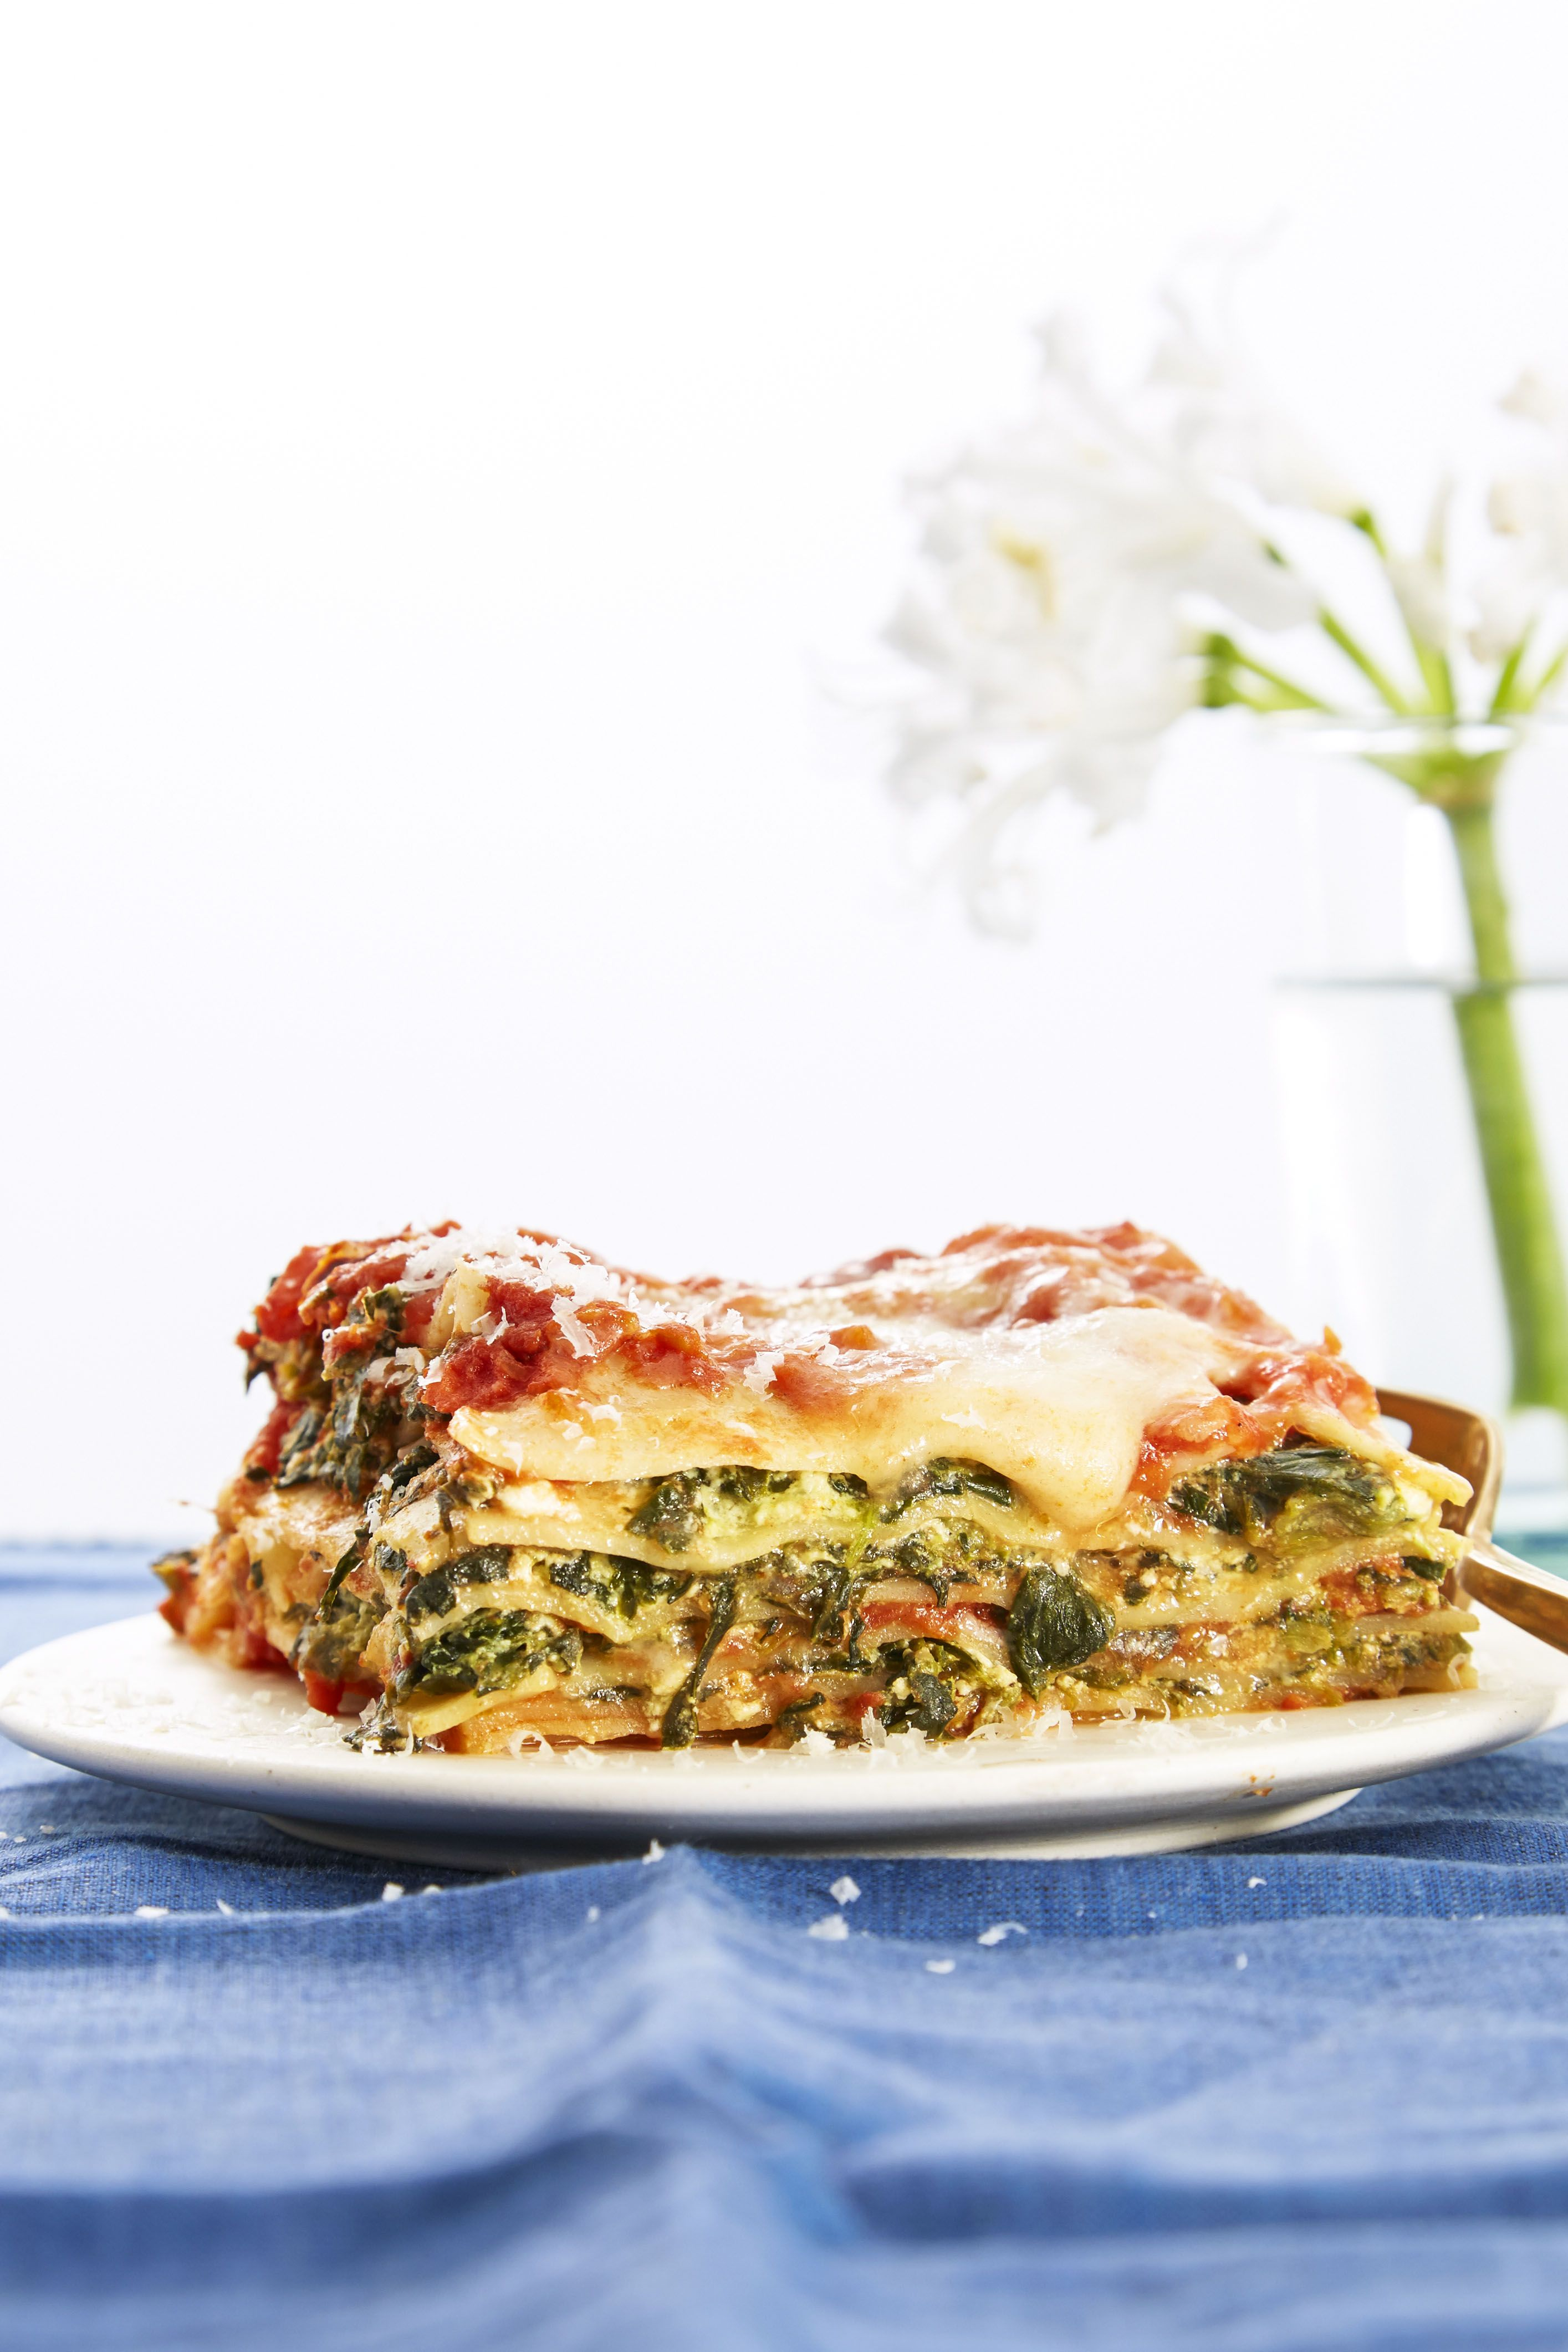 32 Family Dinner Ideas - Easy Recipes for Large Groups